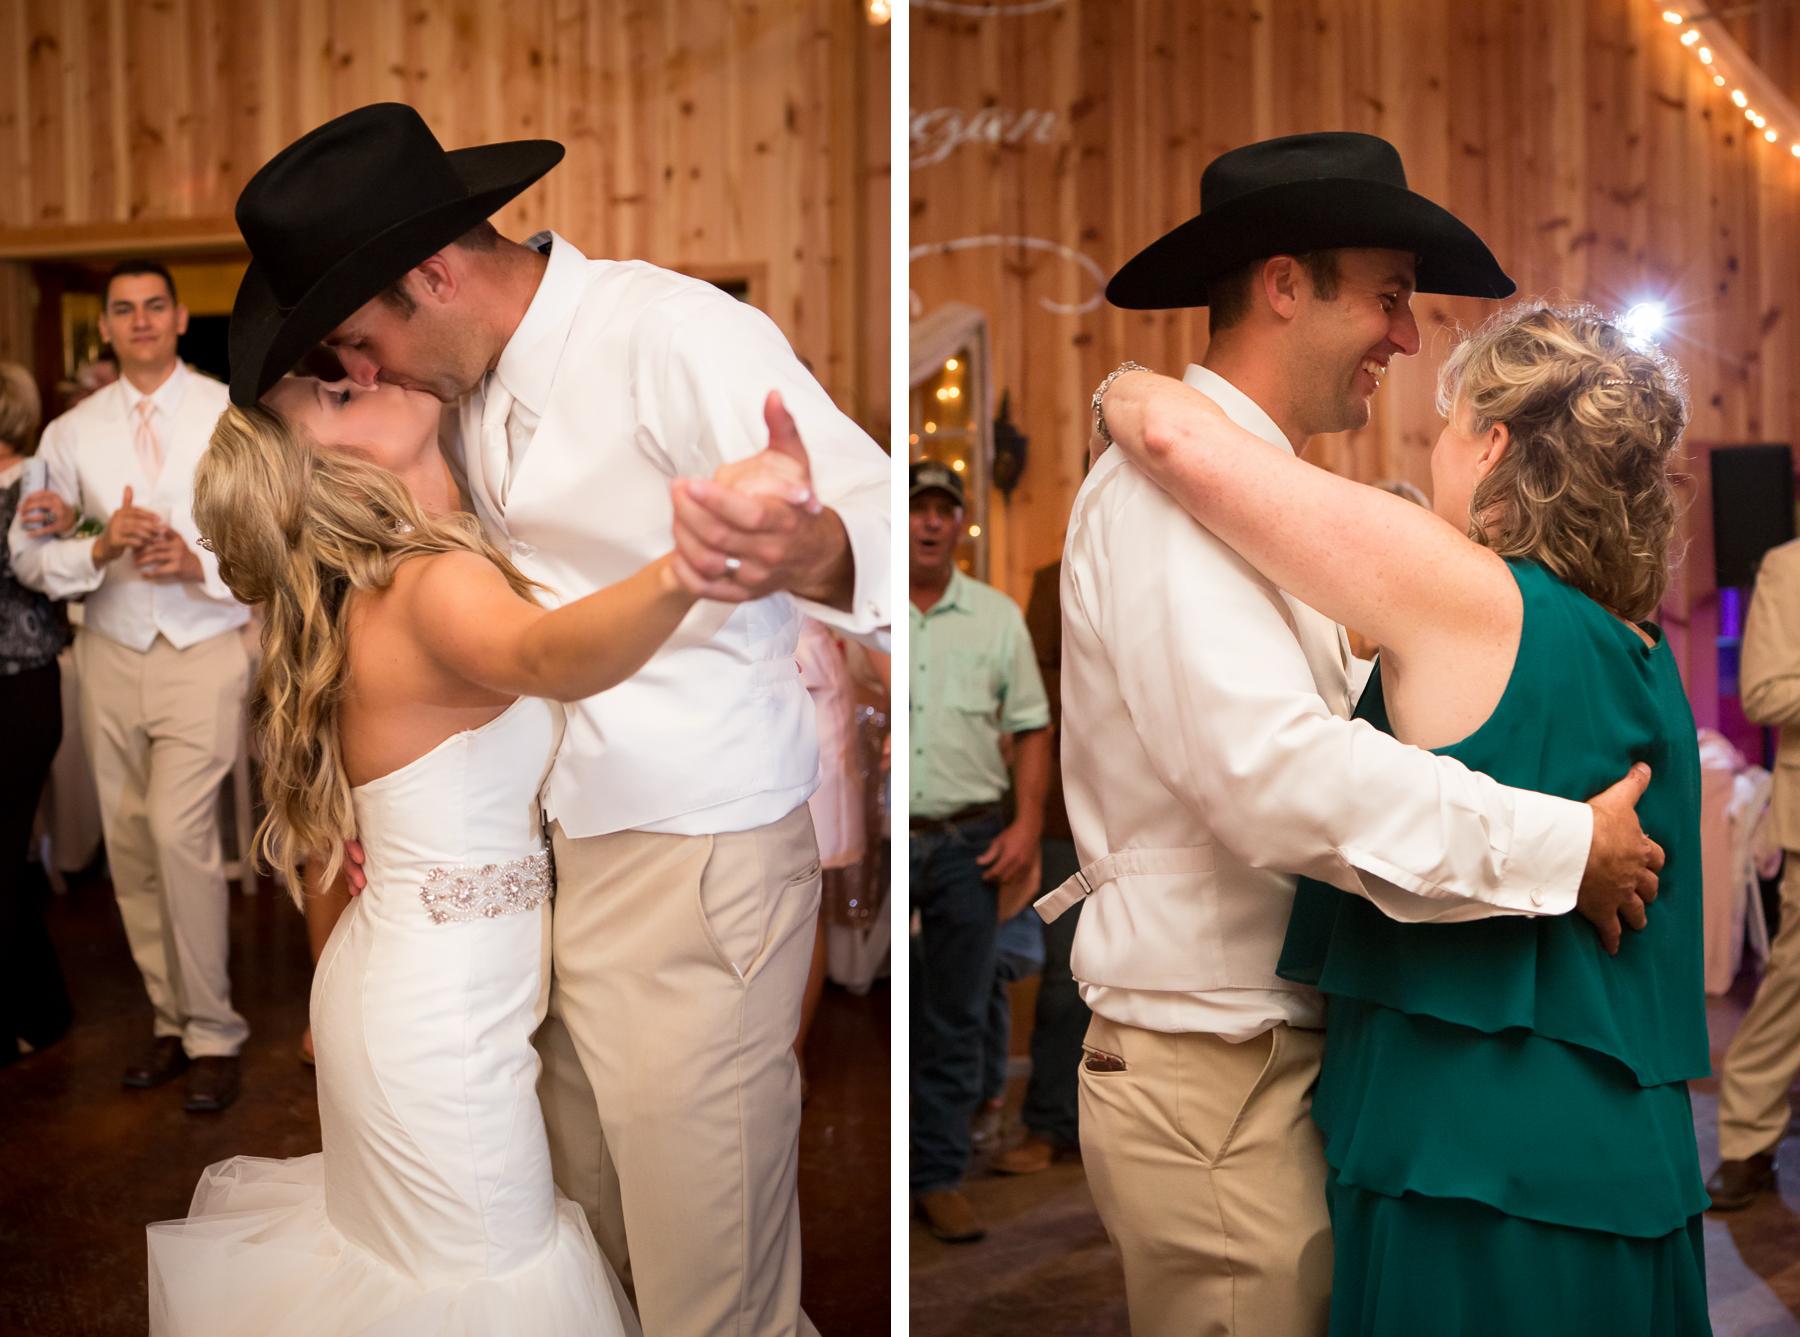 wedding-party-wedding-photos-1.jpg